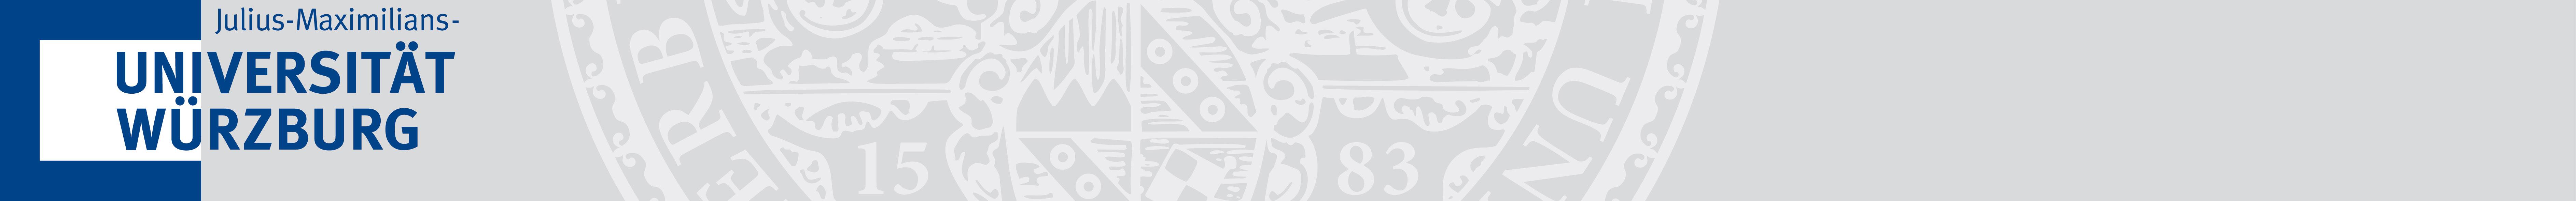 test/decks/title-banner-jmu.jpg